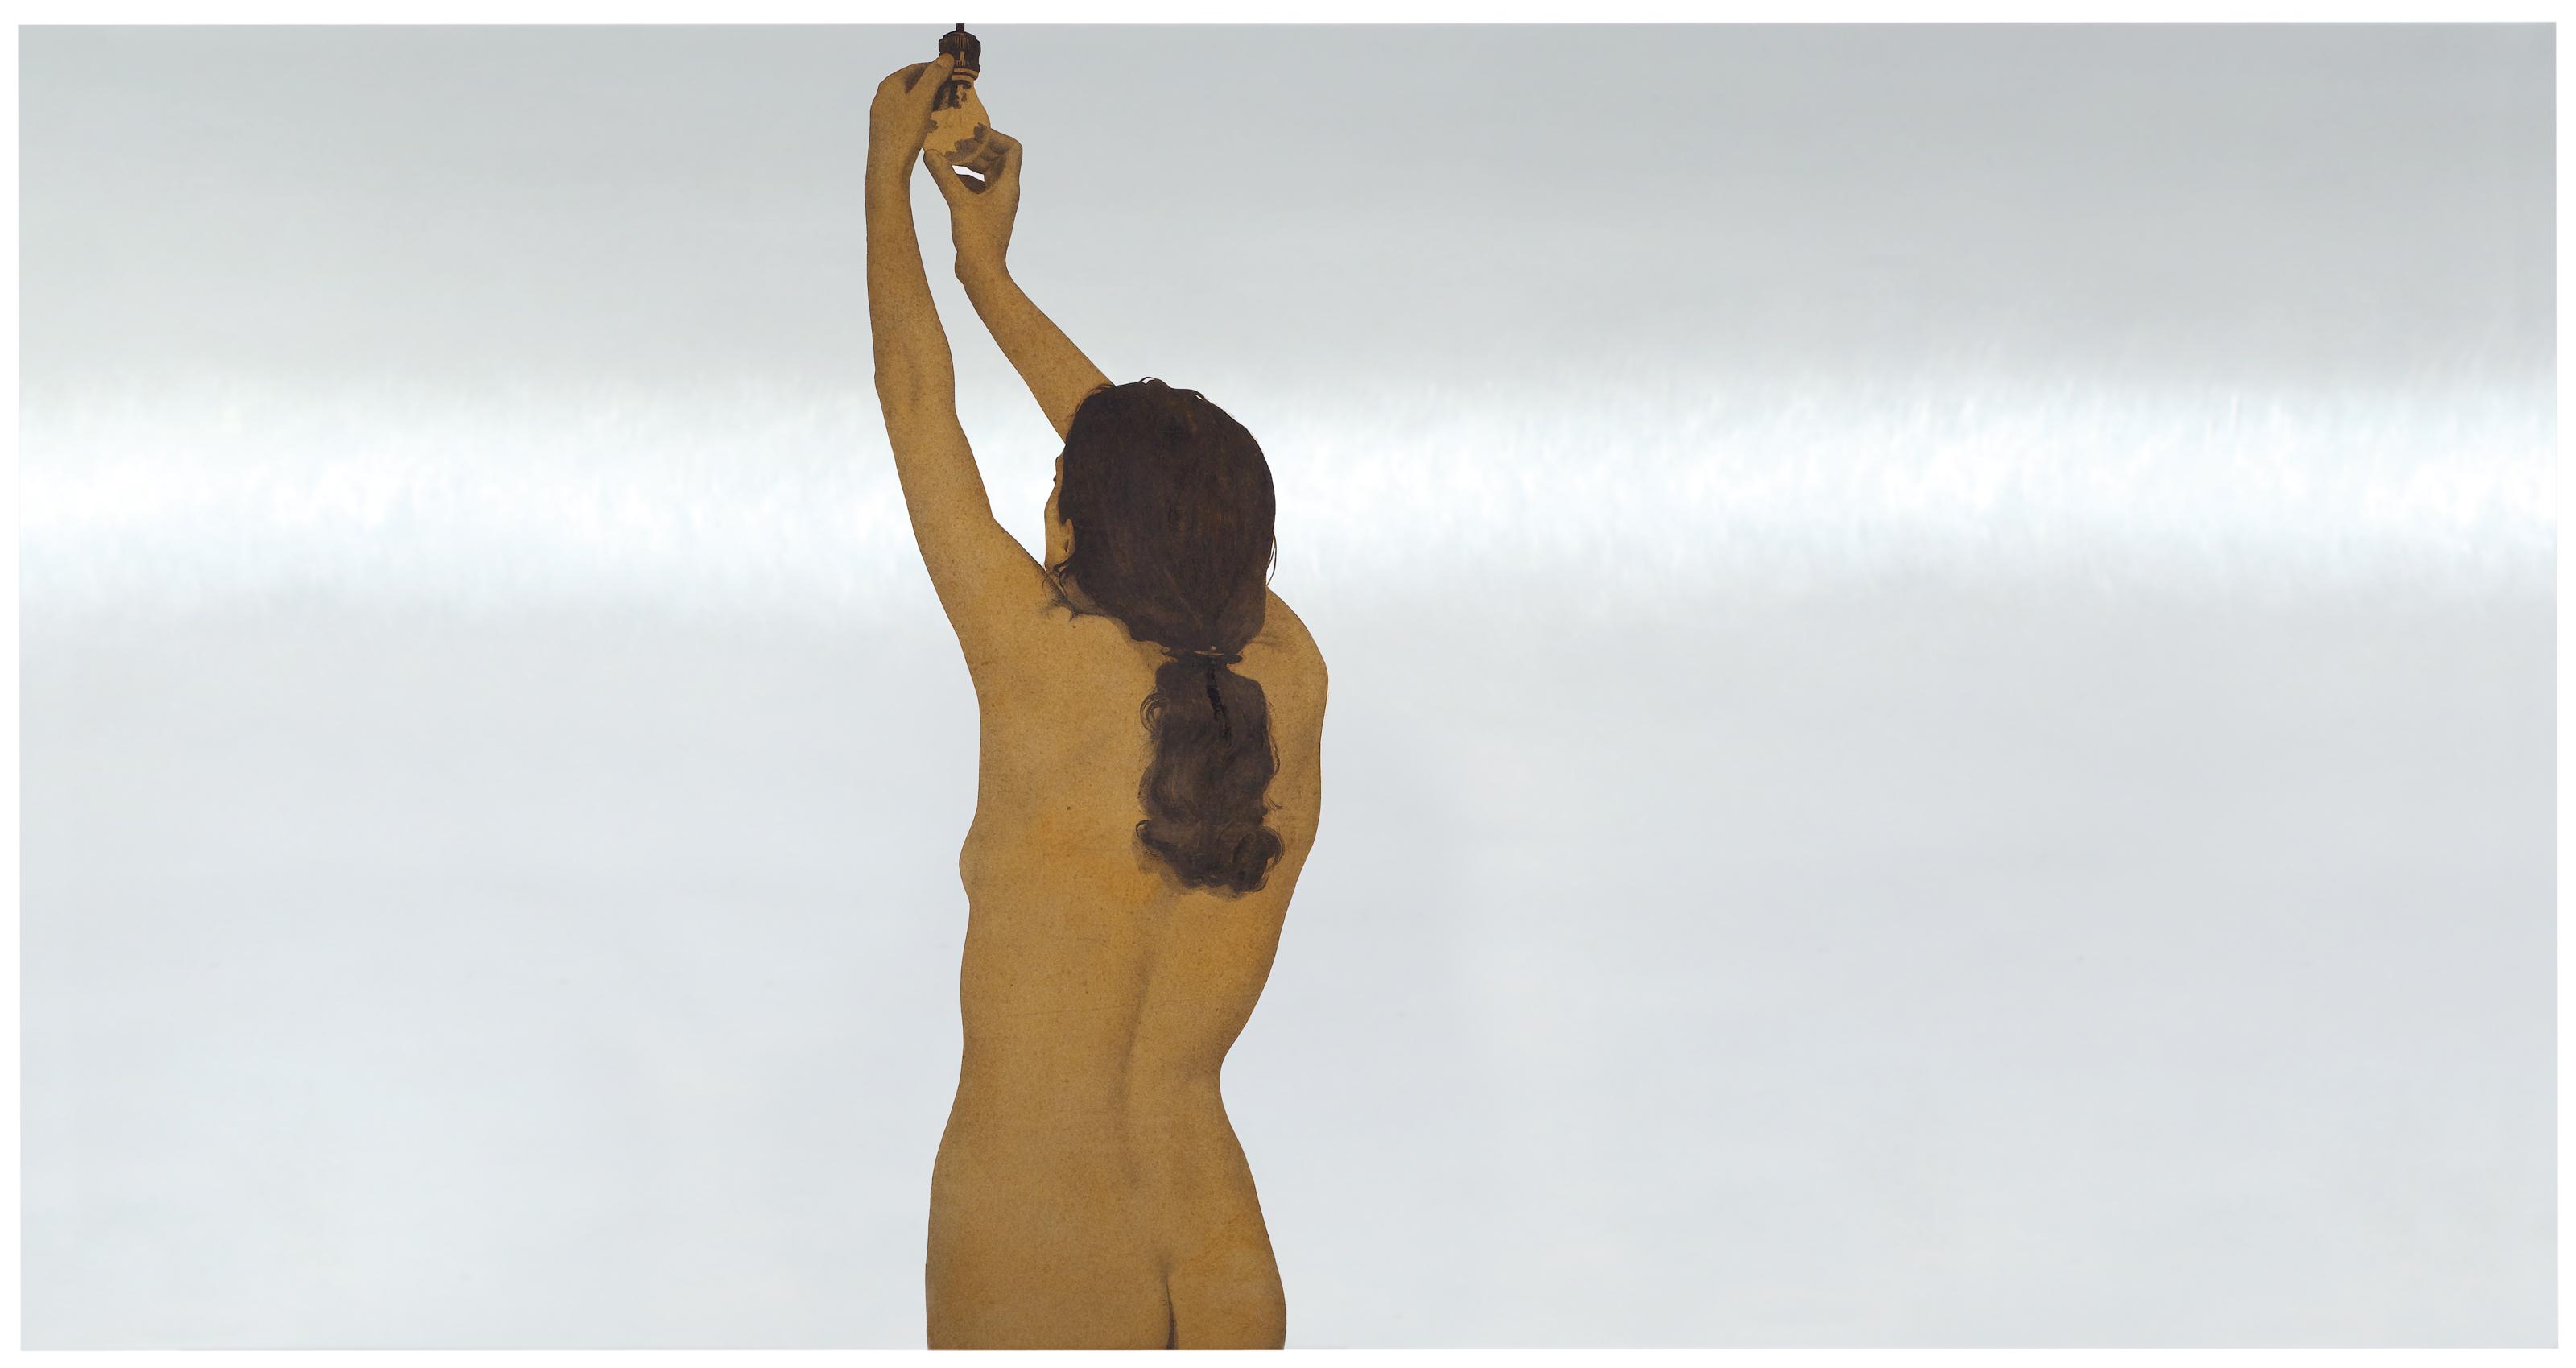 Donna nuda che avvita una lampadina (Nude woman affixing a light bulb)